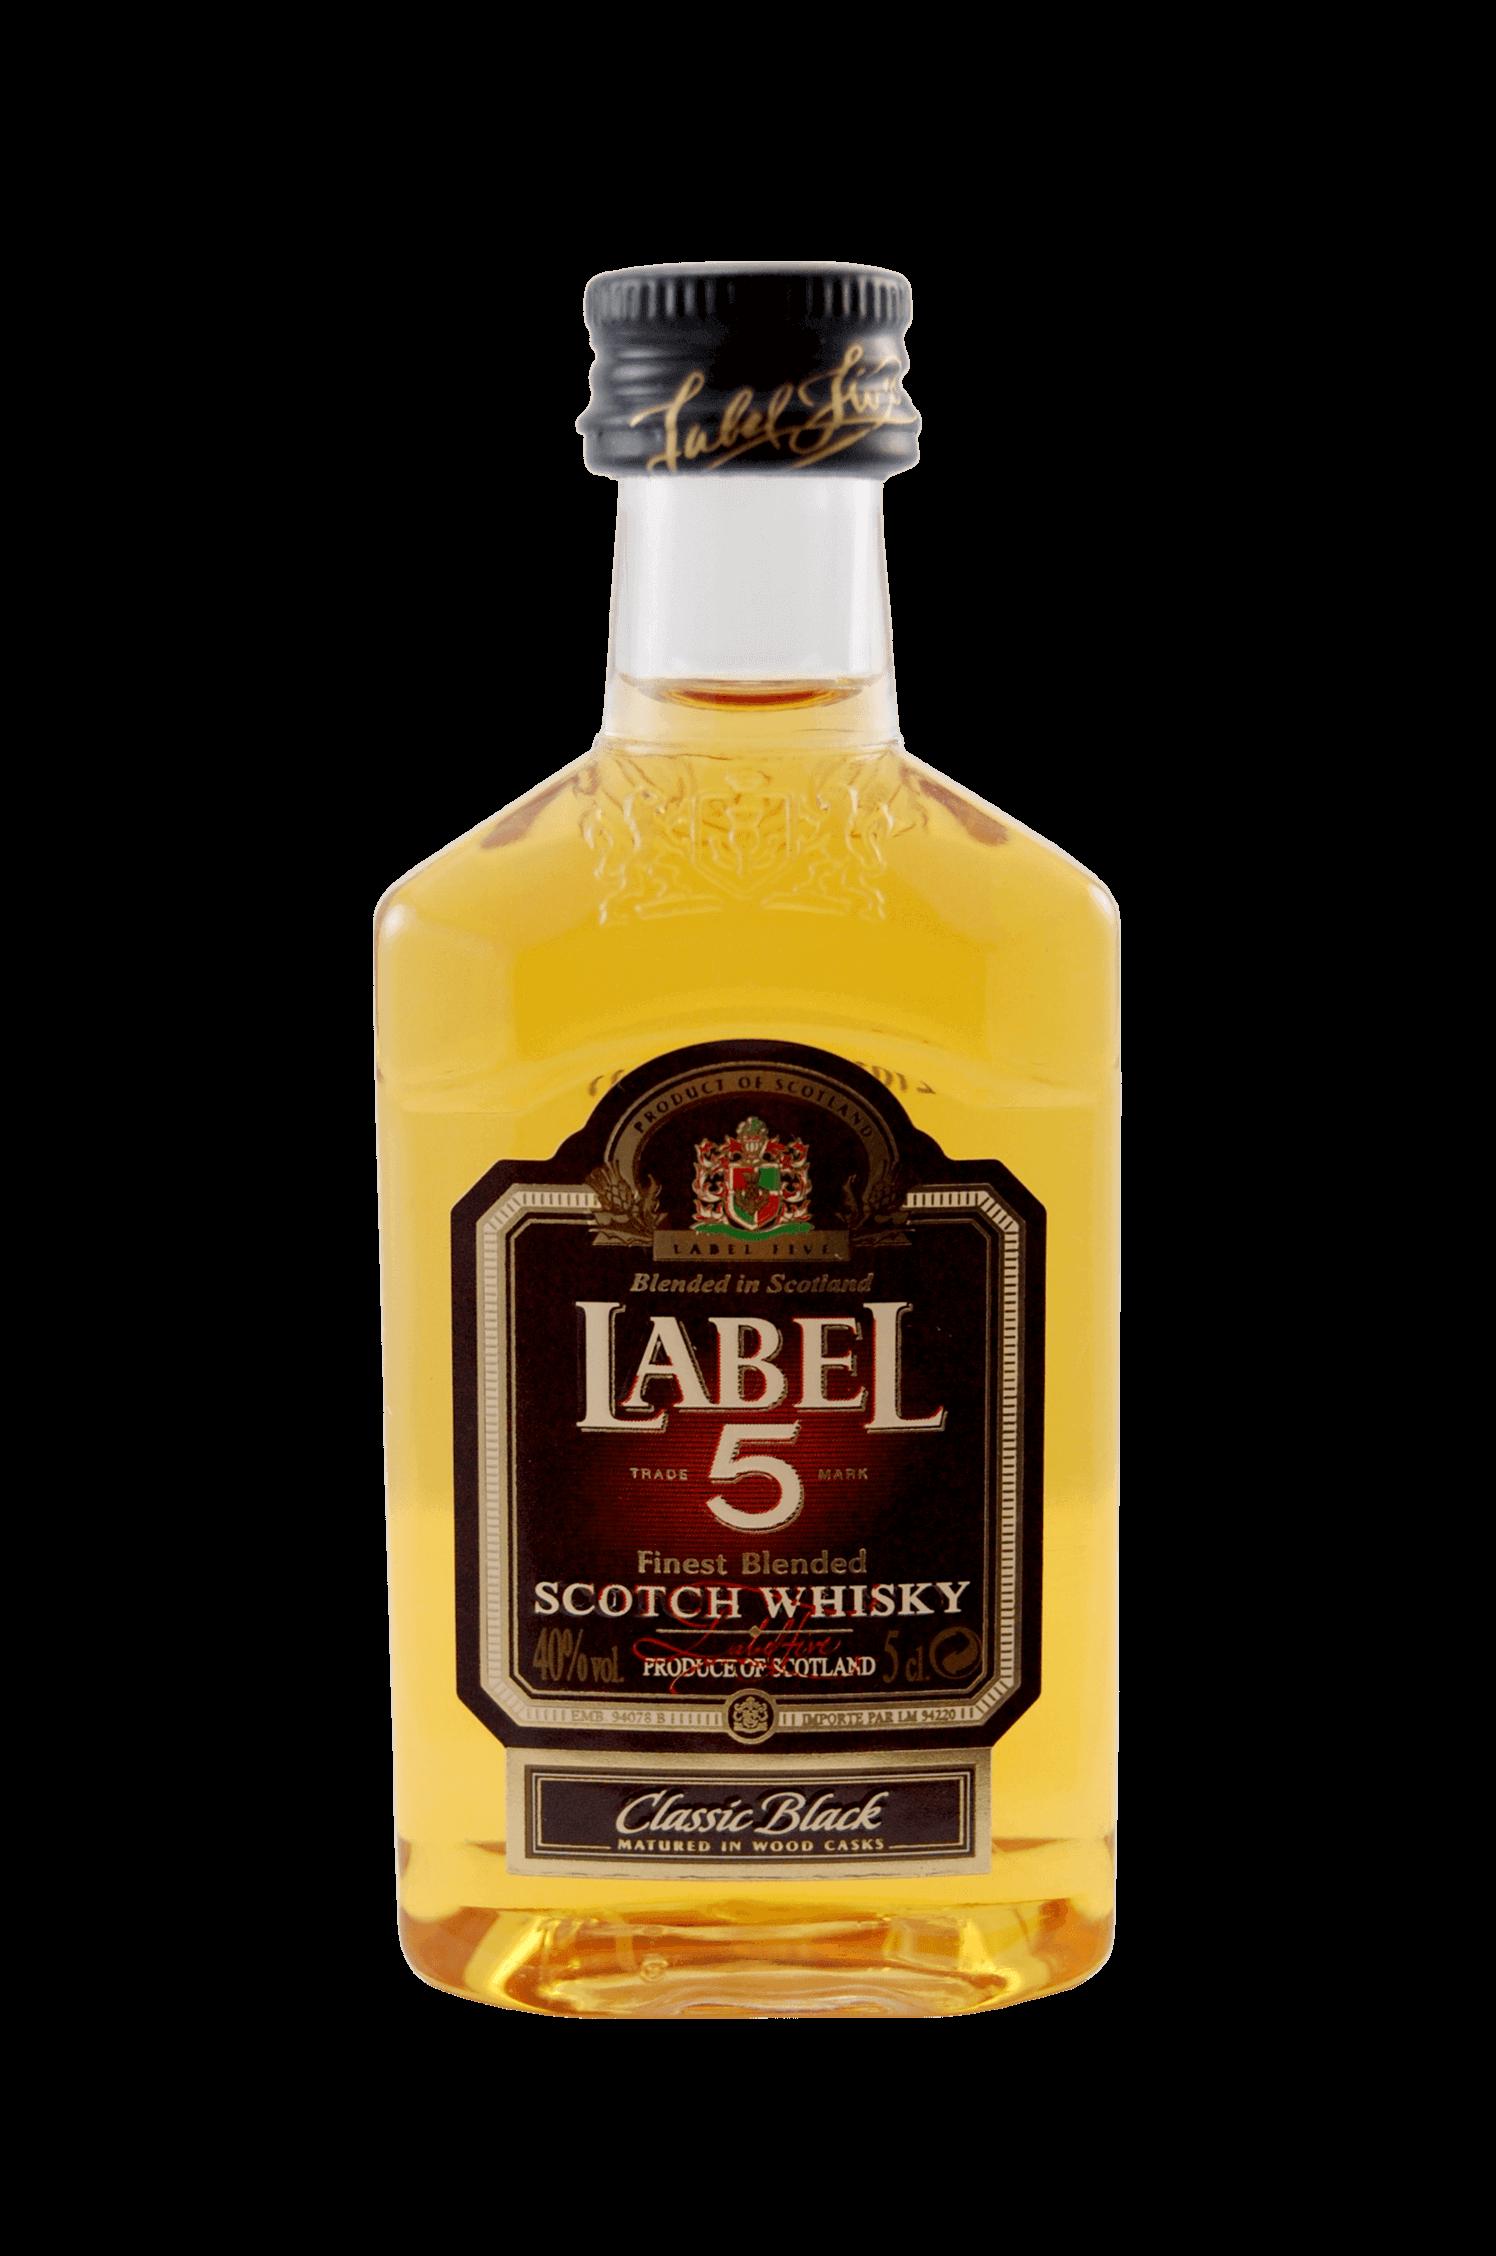 Laber 5 Whisky